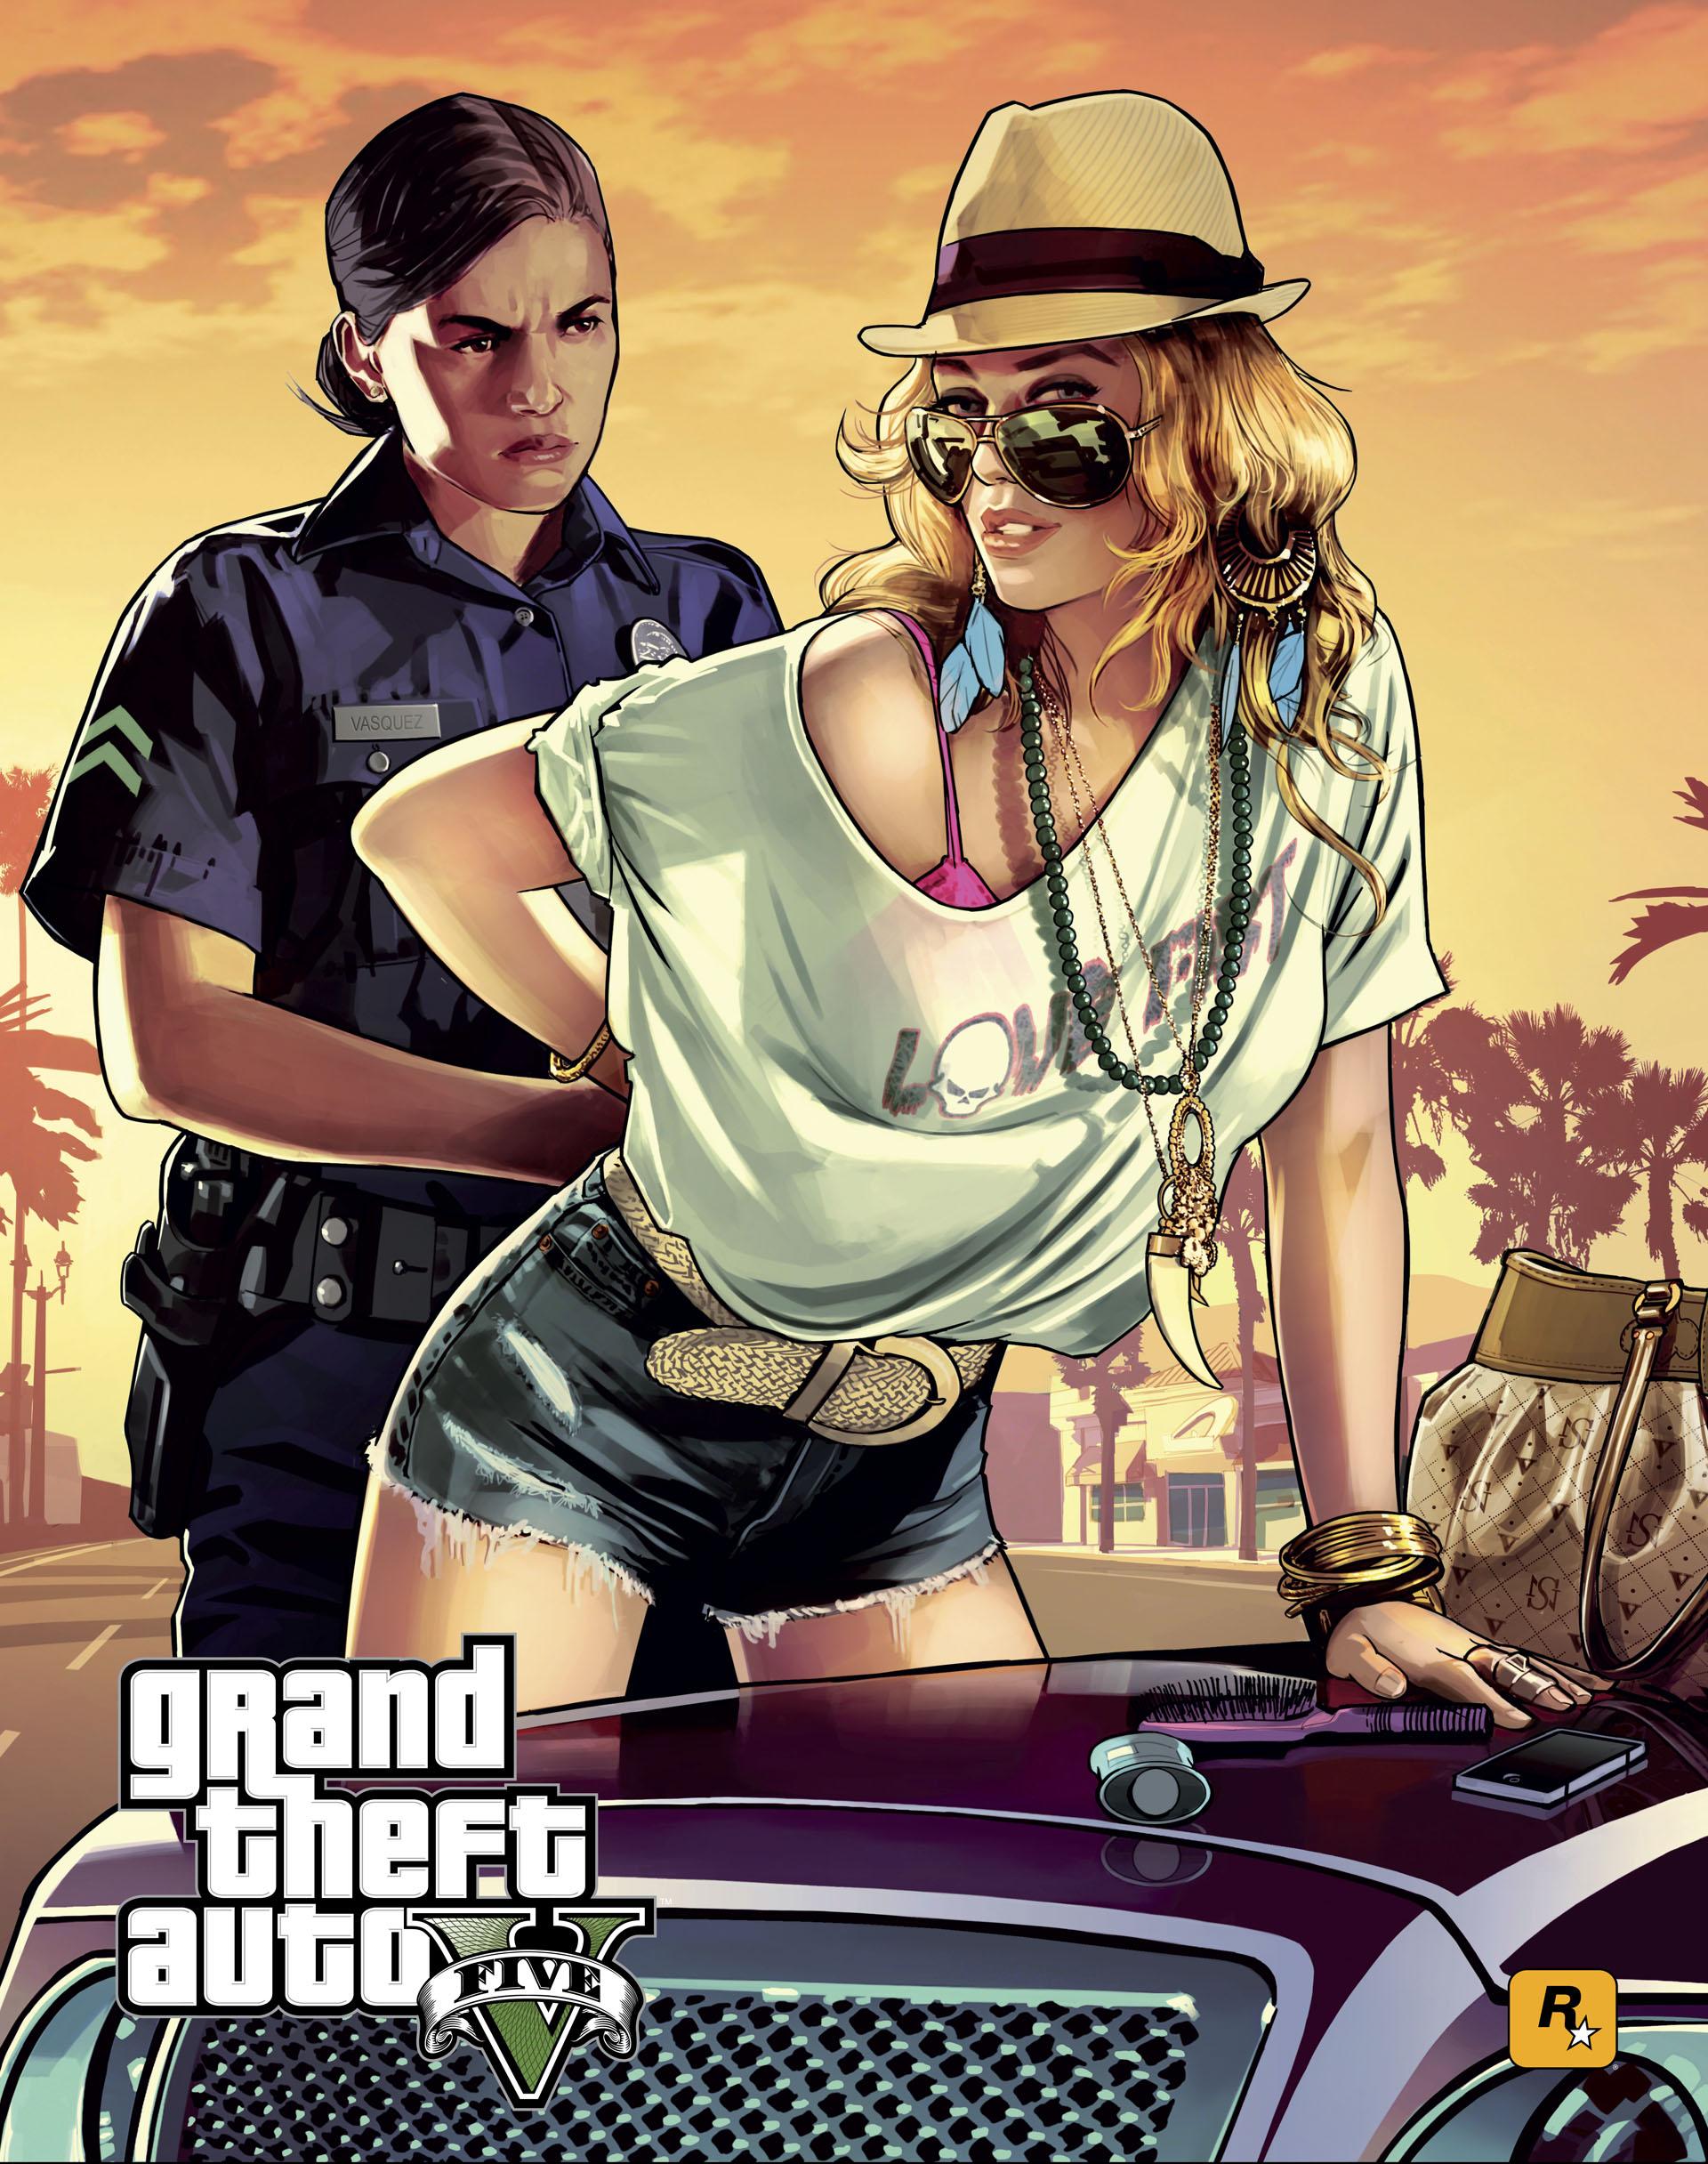 v_police_lady.jpg